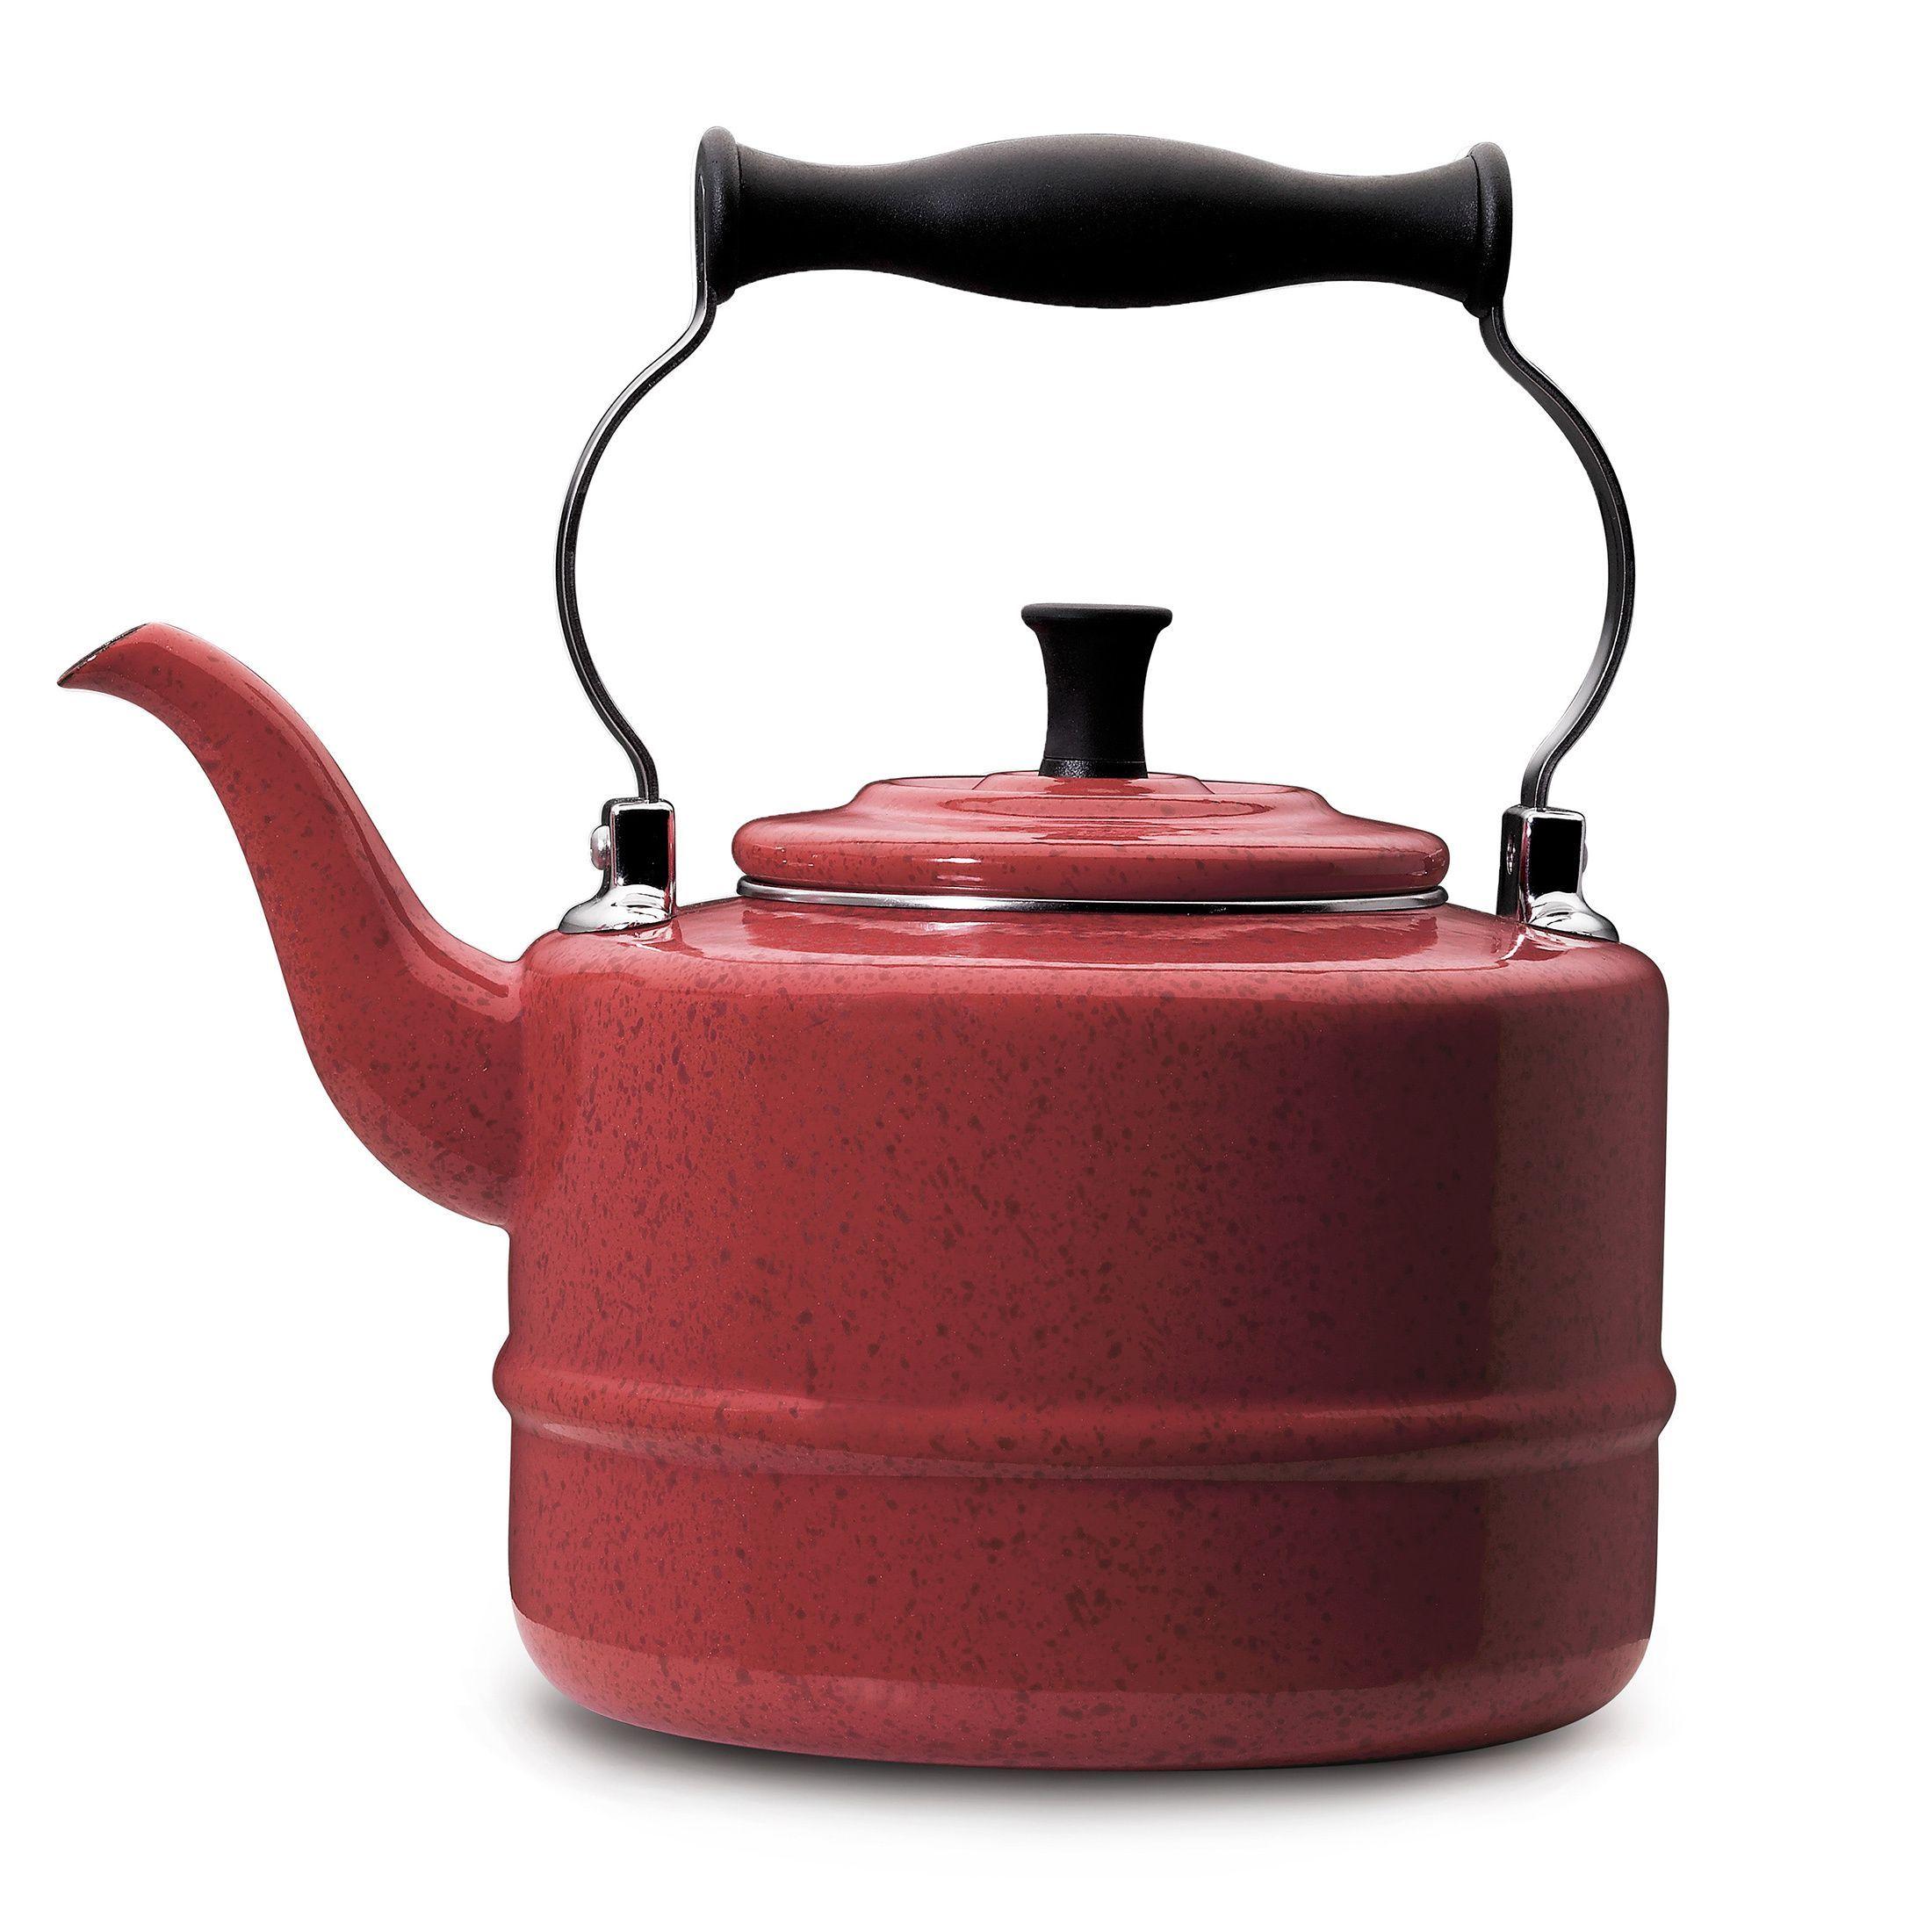 li brew up a hot cup of tea with this paula deen kettle ul li